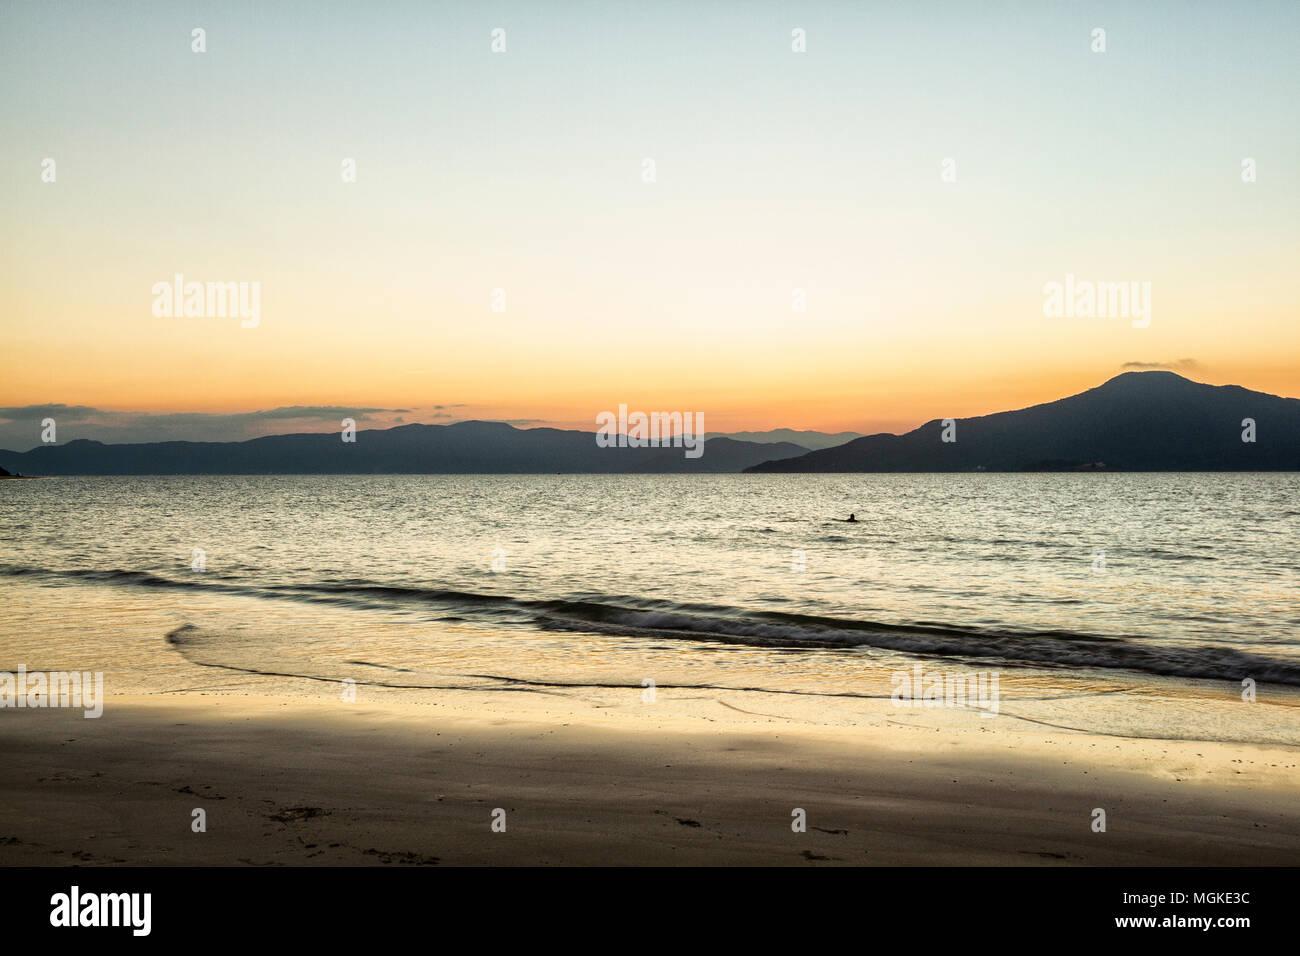 Praia da Daniela ao anoitecer. Florianópolis, Santa Catarina, Brasil. / Daniela Beach at dusk. Florianopolis, Santa Catarina, Brazil. - Stock Image